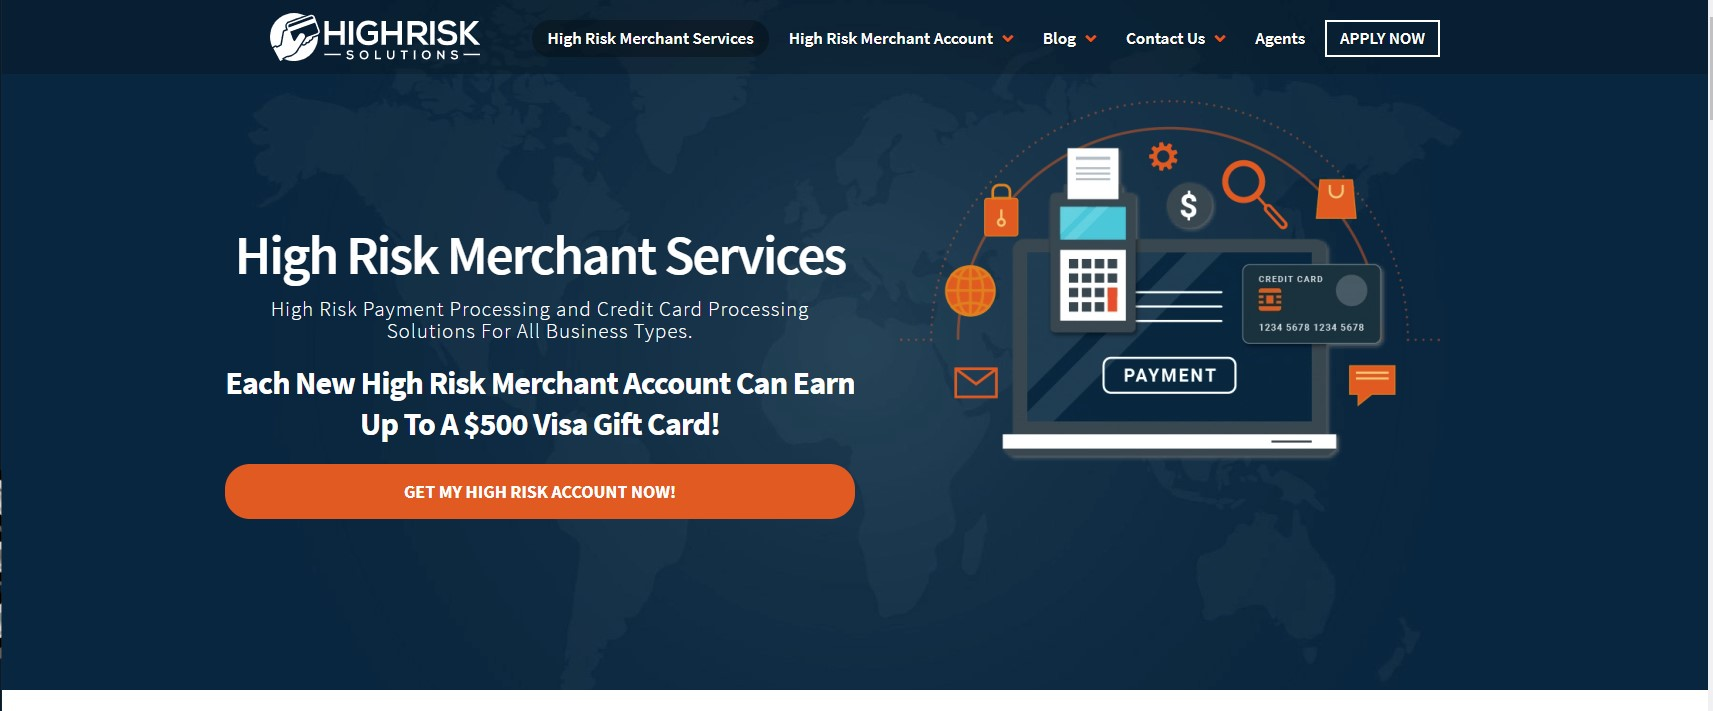 High Risk Merchant Services - Payment Gateway